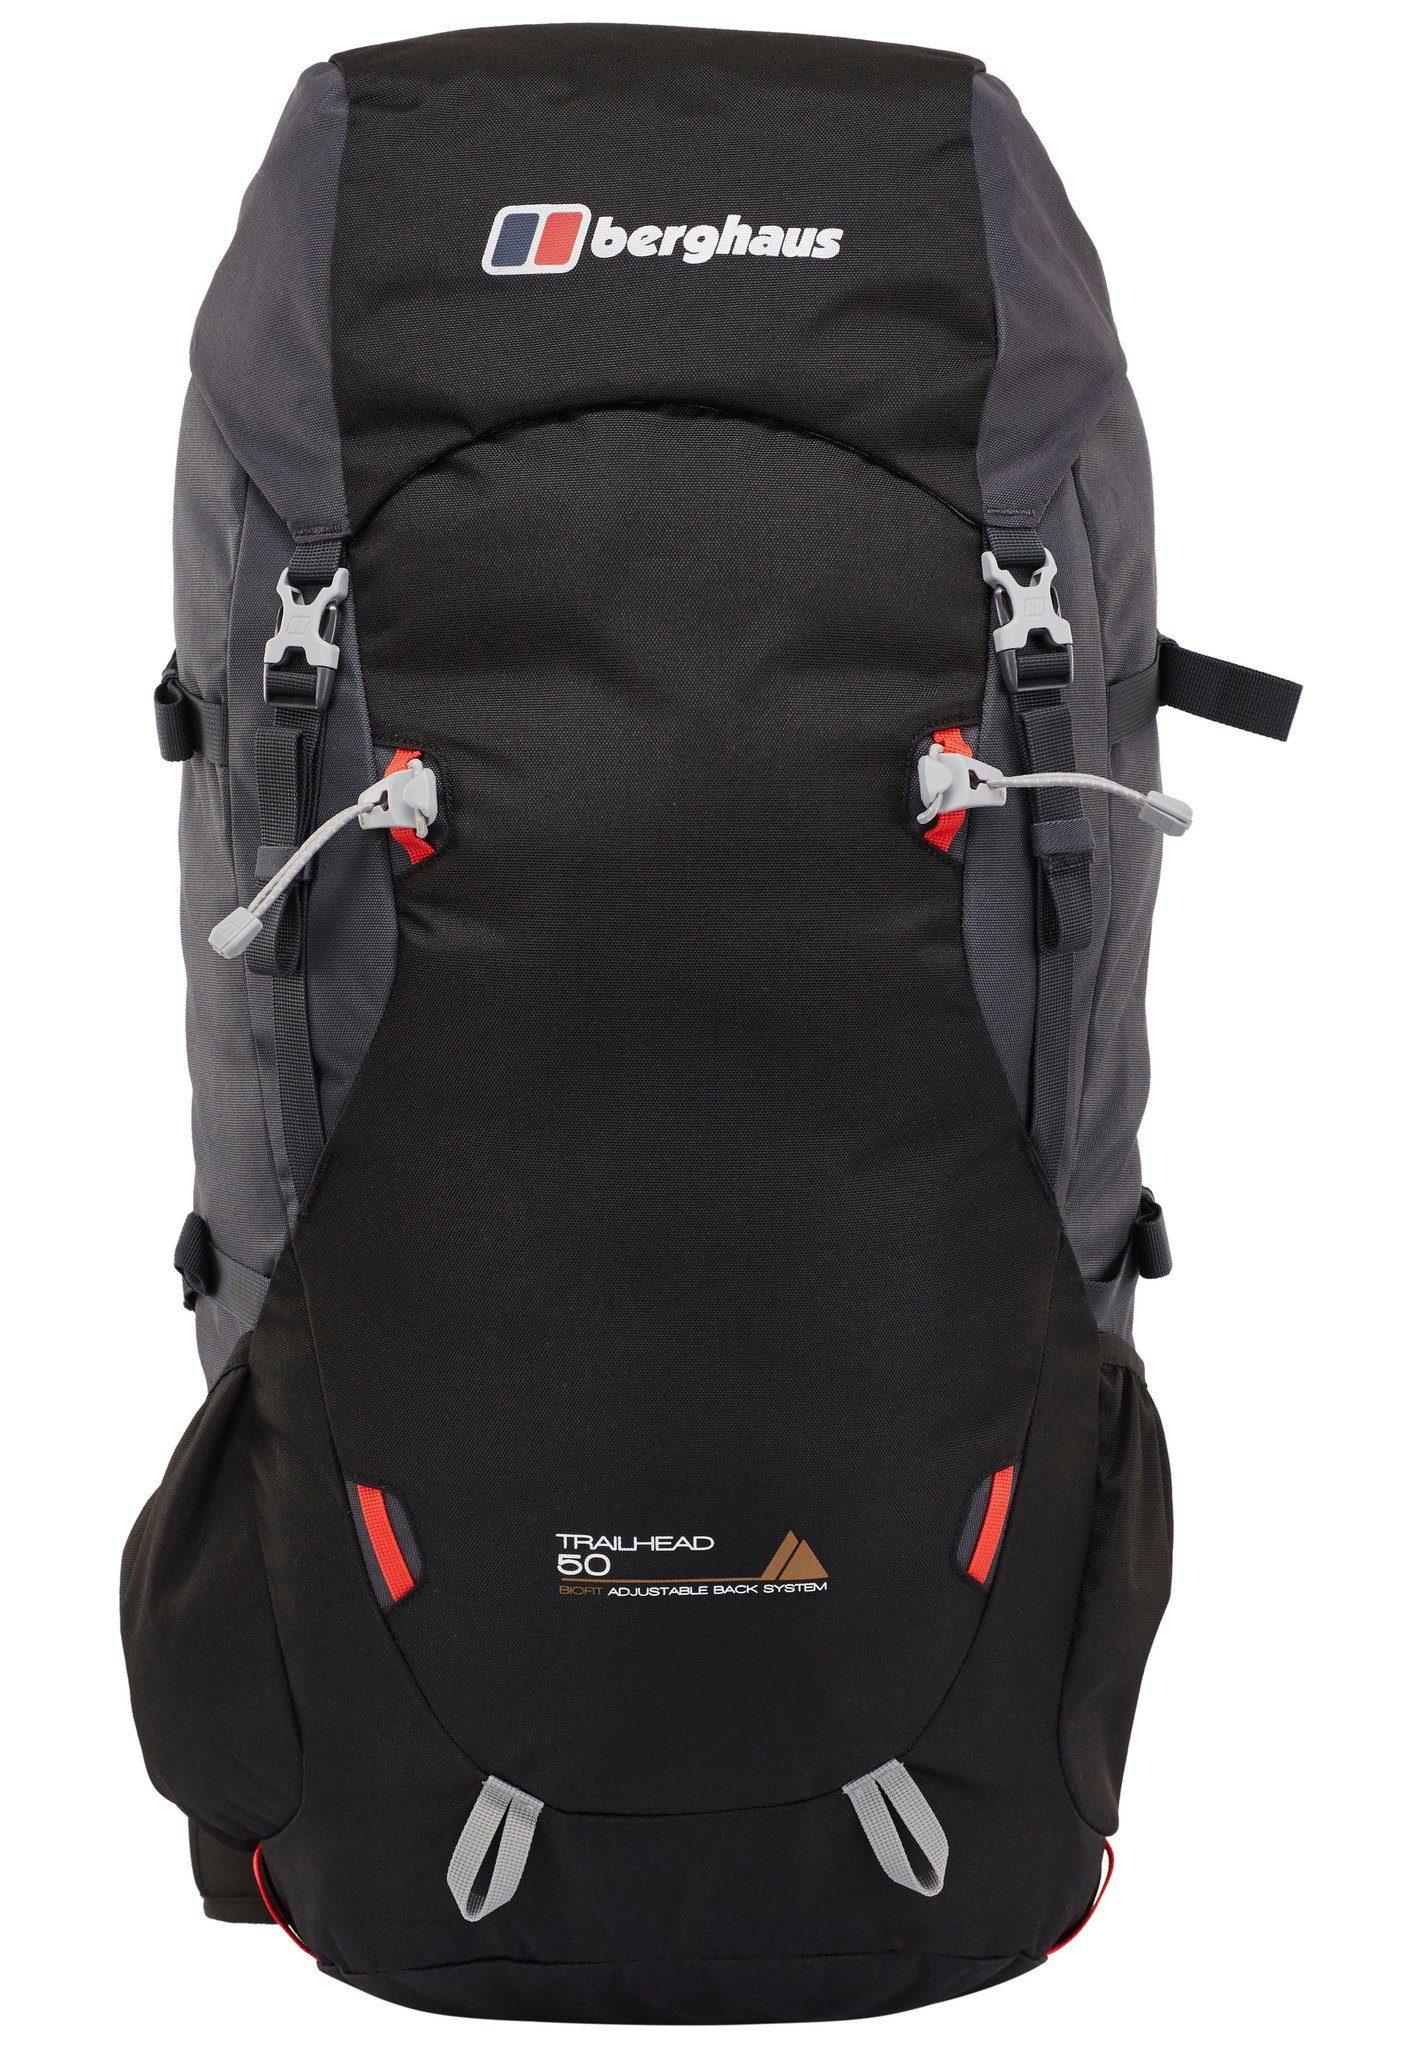 Berghaus Wanderrucksack »Trailhead 50 Backpack«